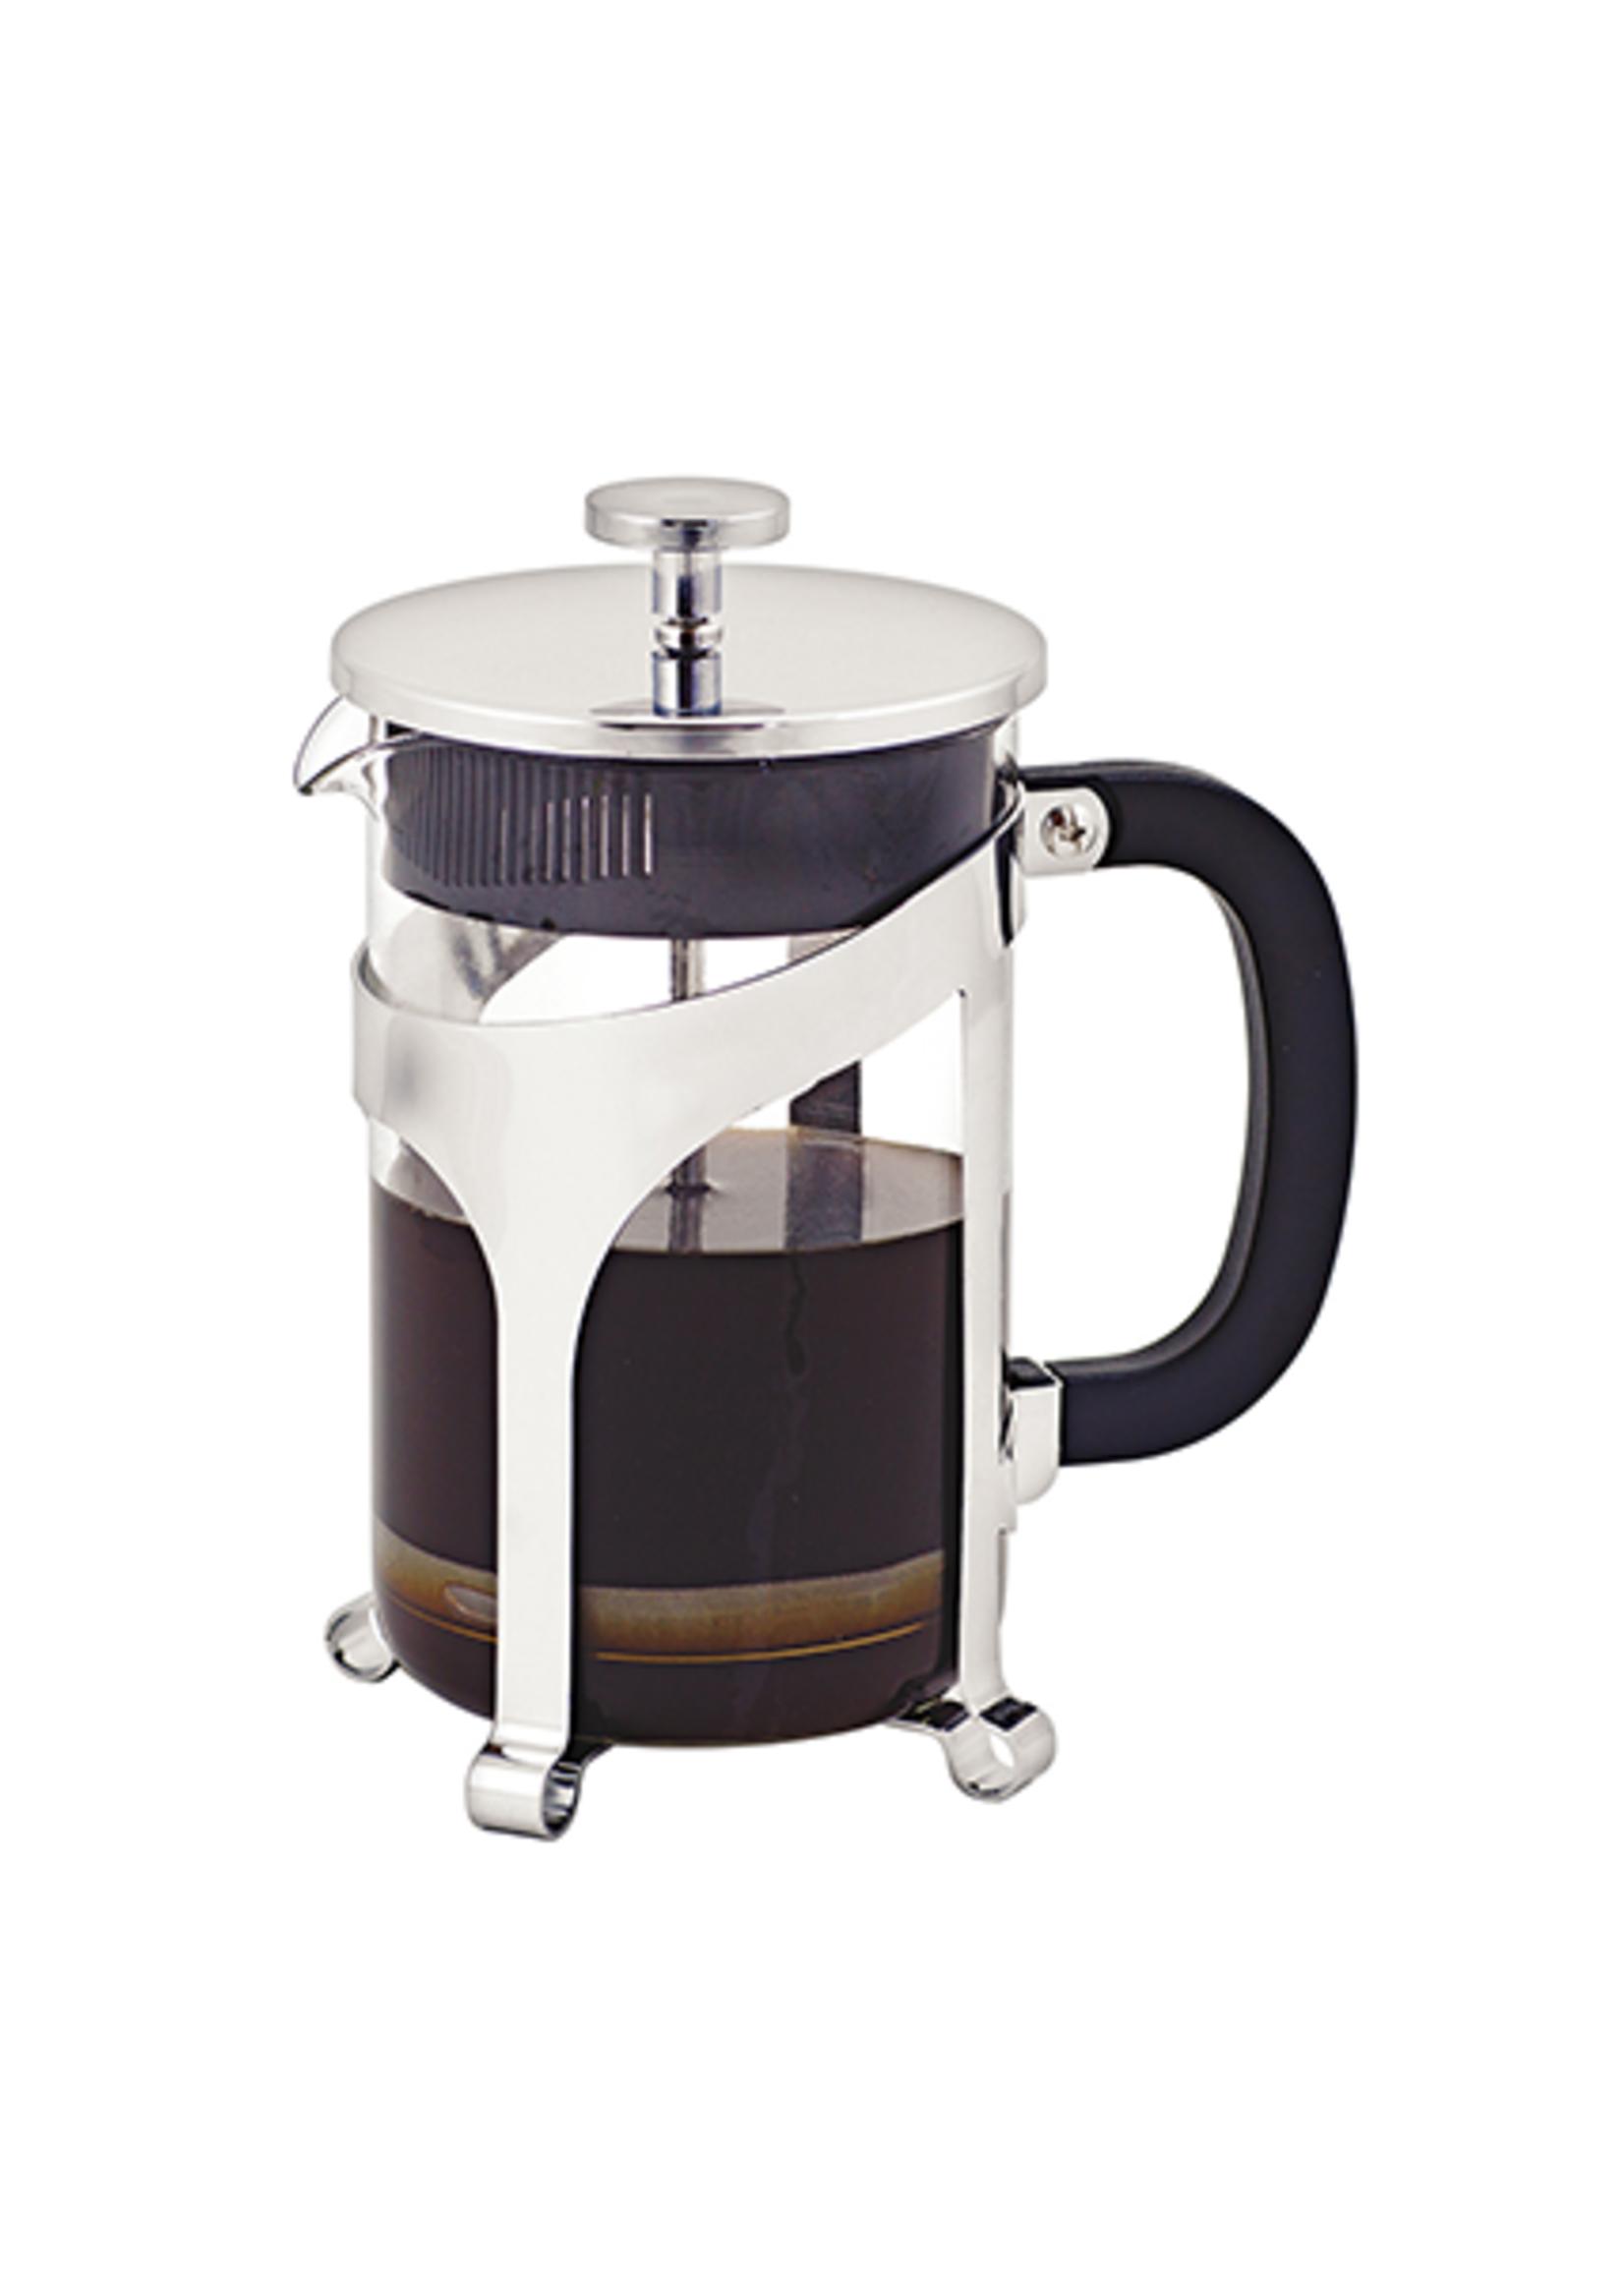 Avanti Homewares Cafe Press Coffee Plunger 750ml 6 Cup